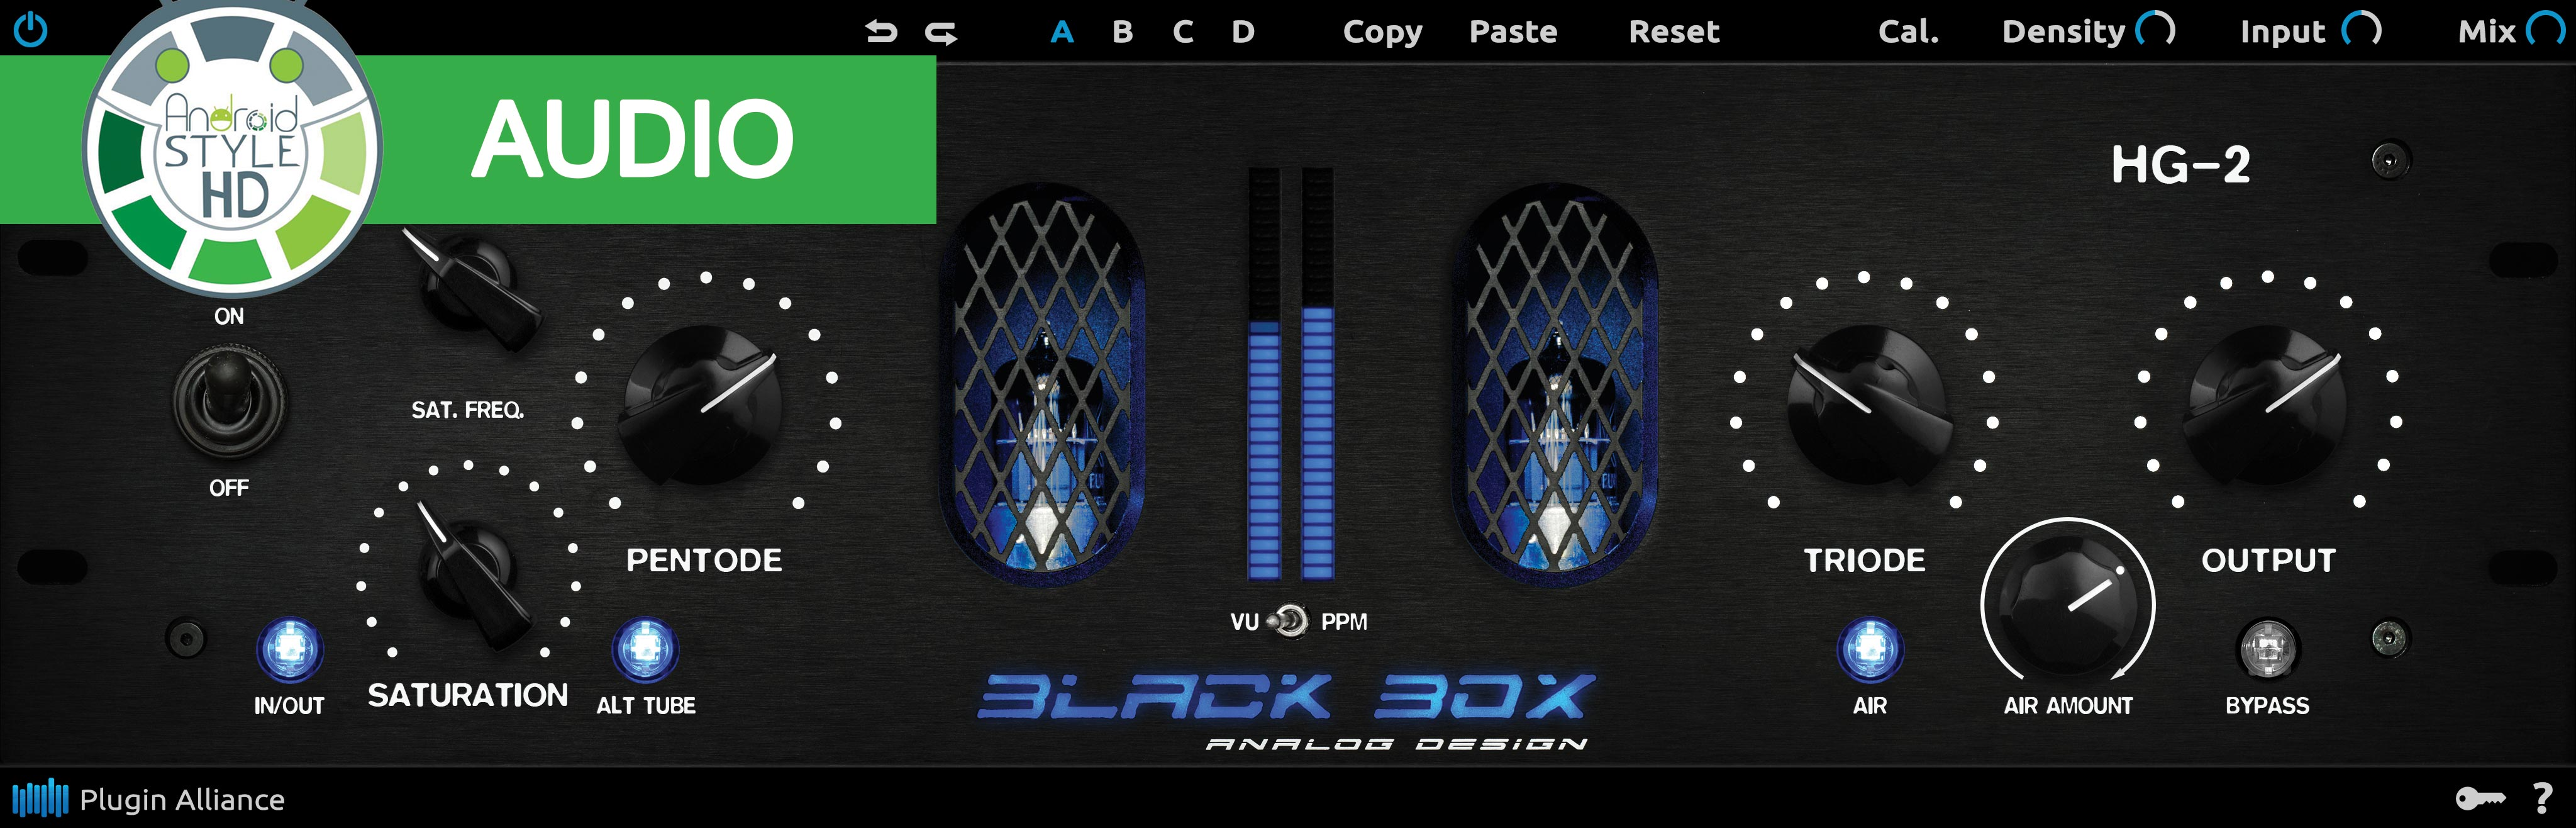 Recensione - Plugin Alliance: Black Box Analog Design HG-2